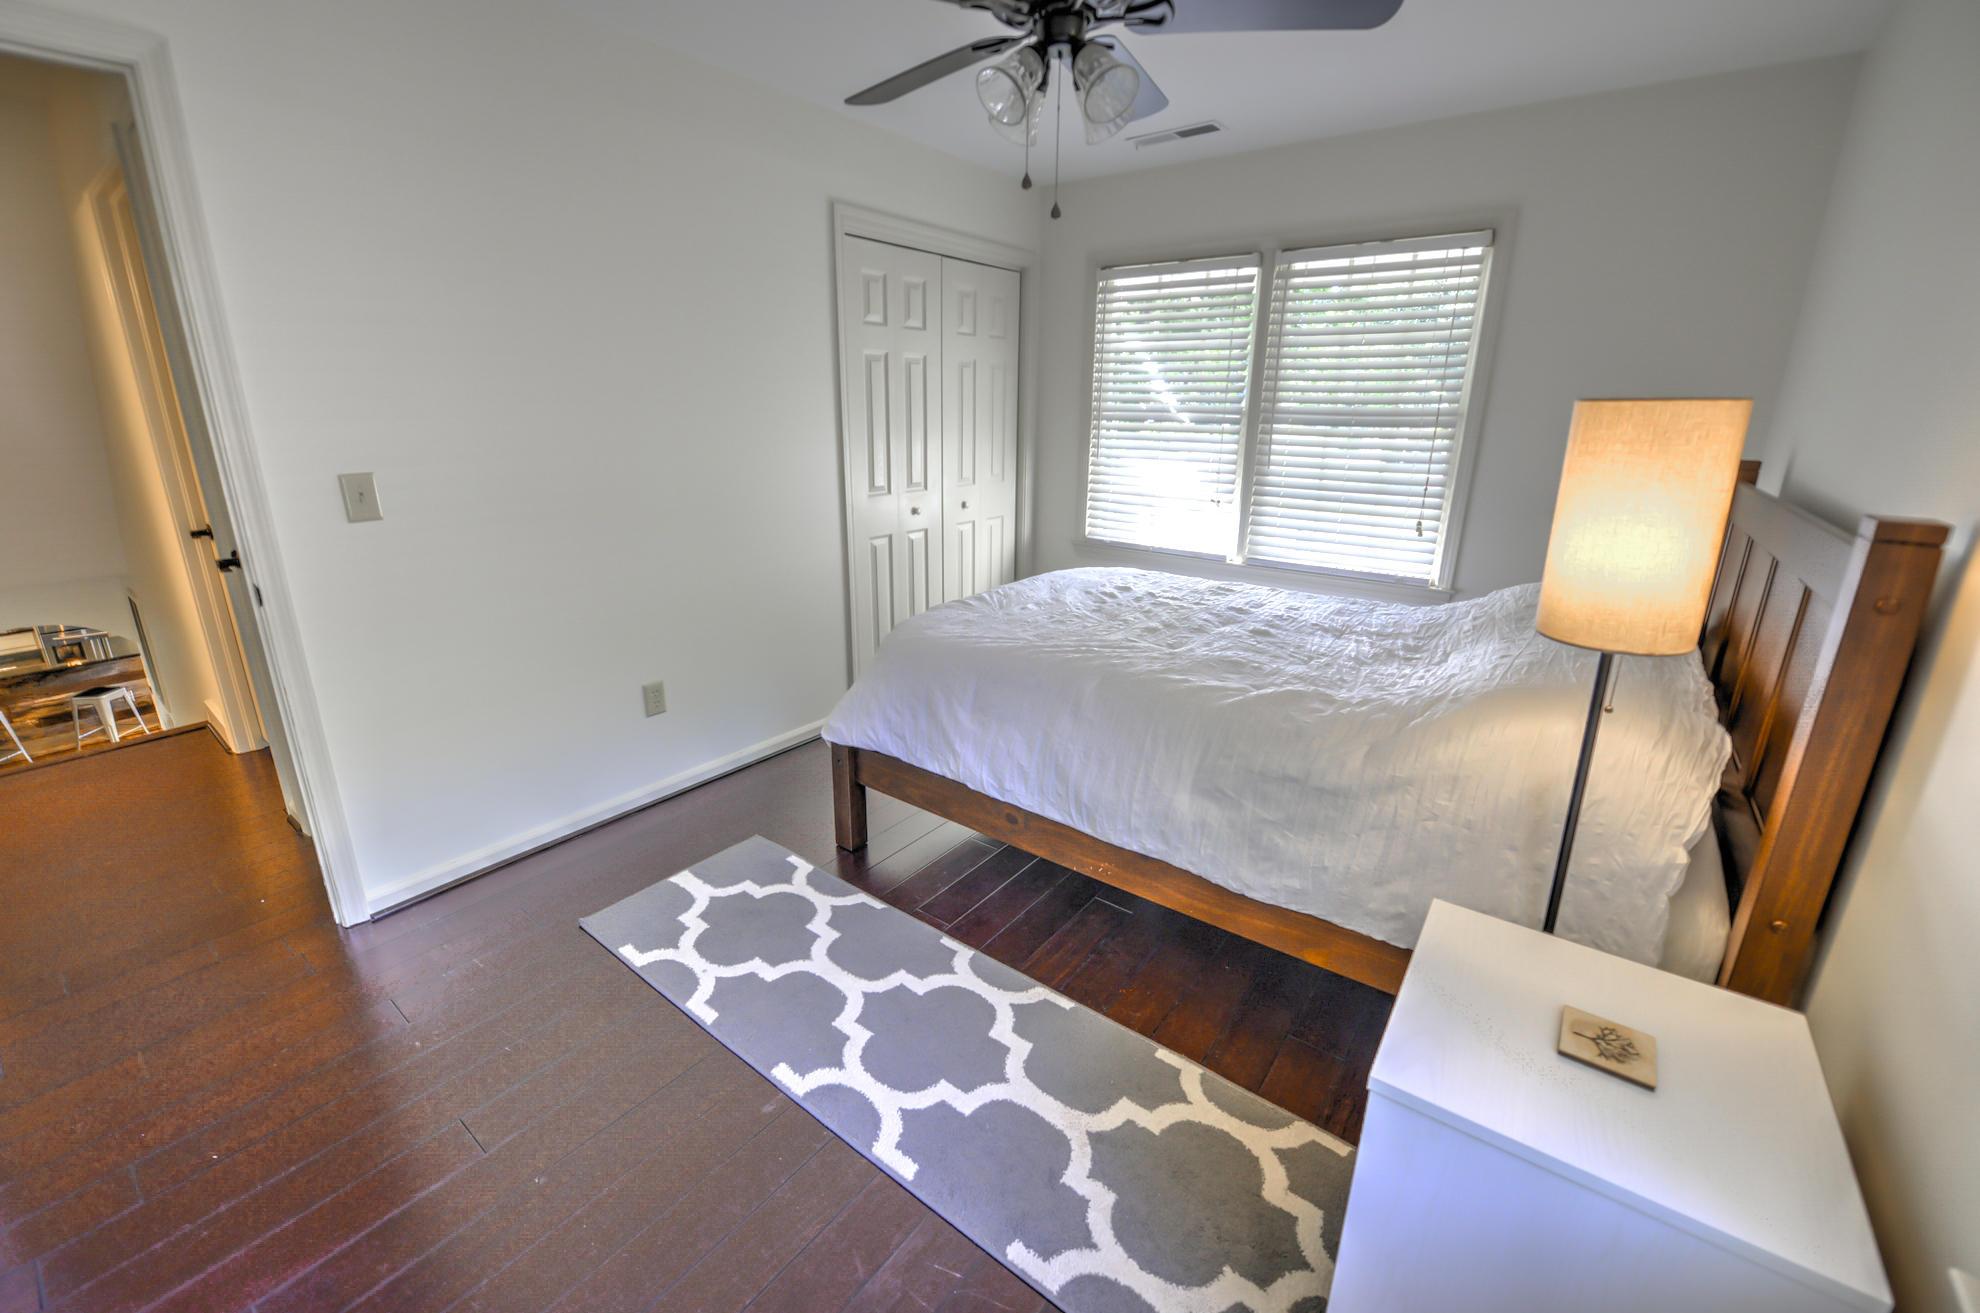 Shemwood II Homes For Sale - 1017 Jack Snipe, Mount Pleasant, SC - 27